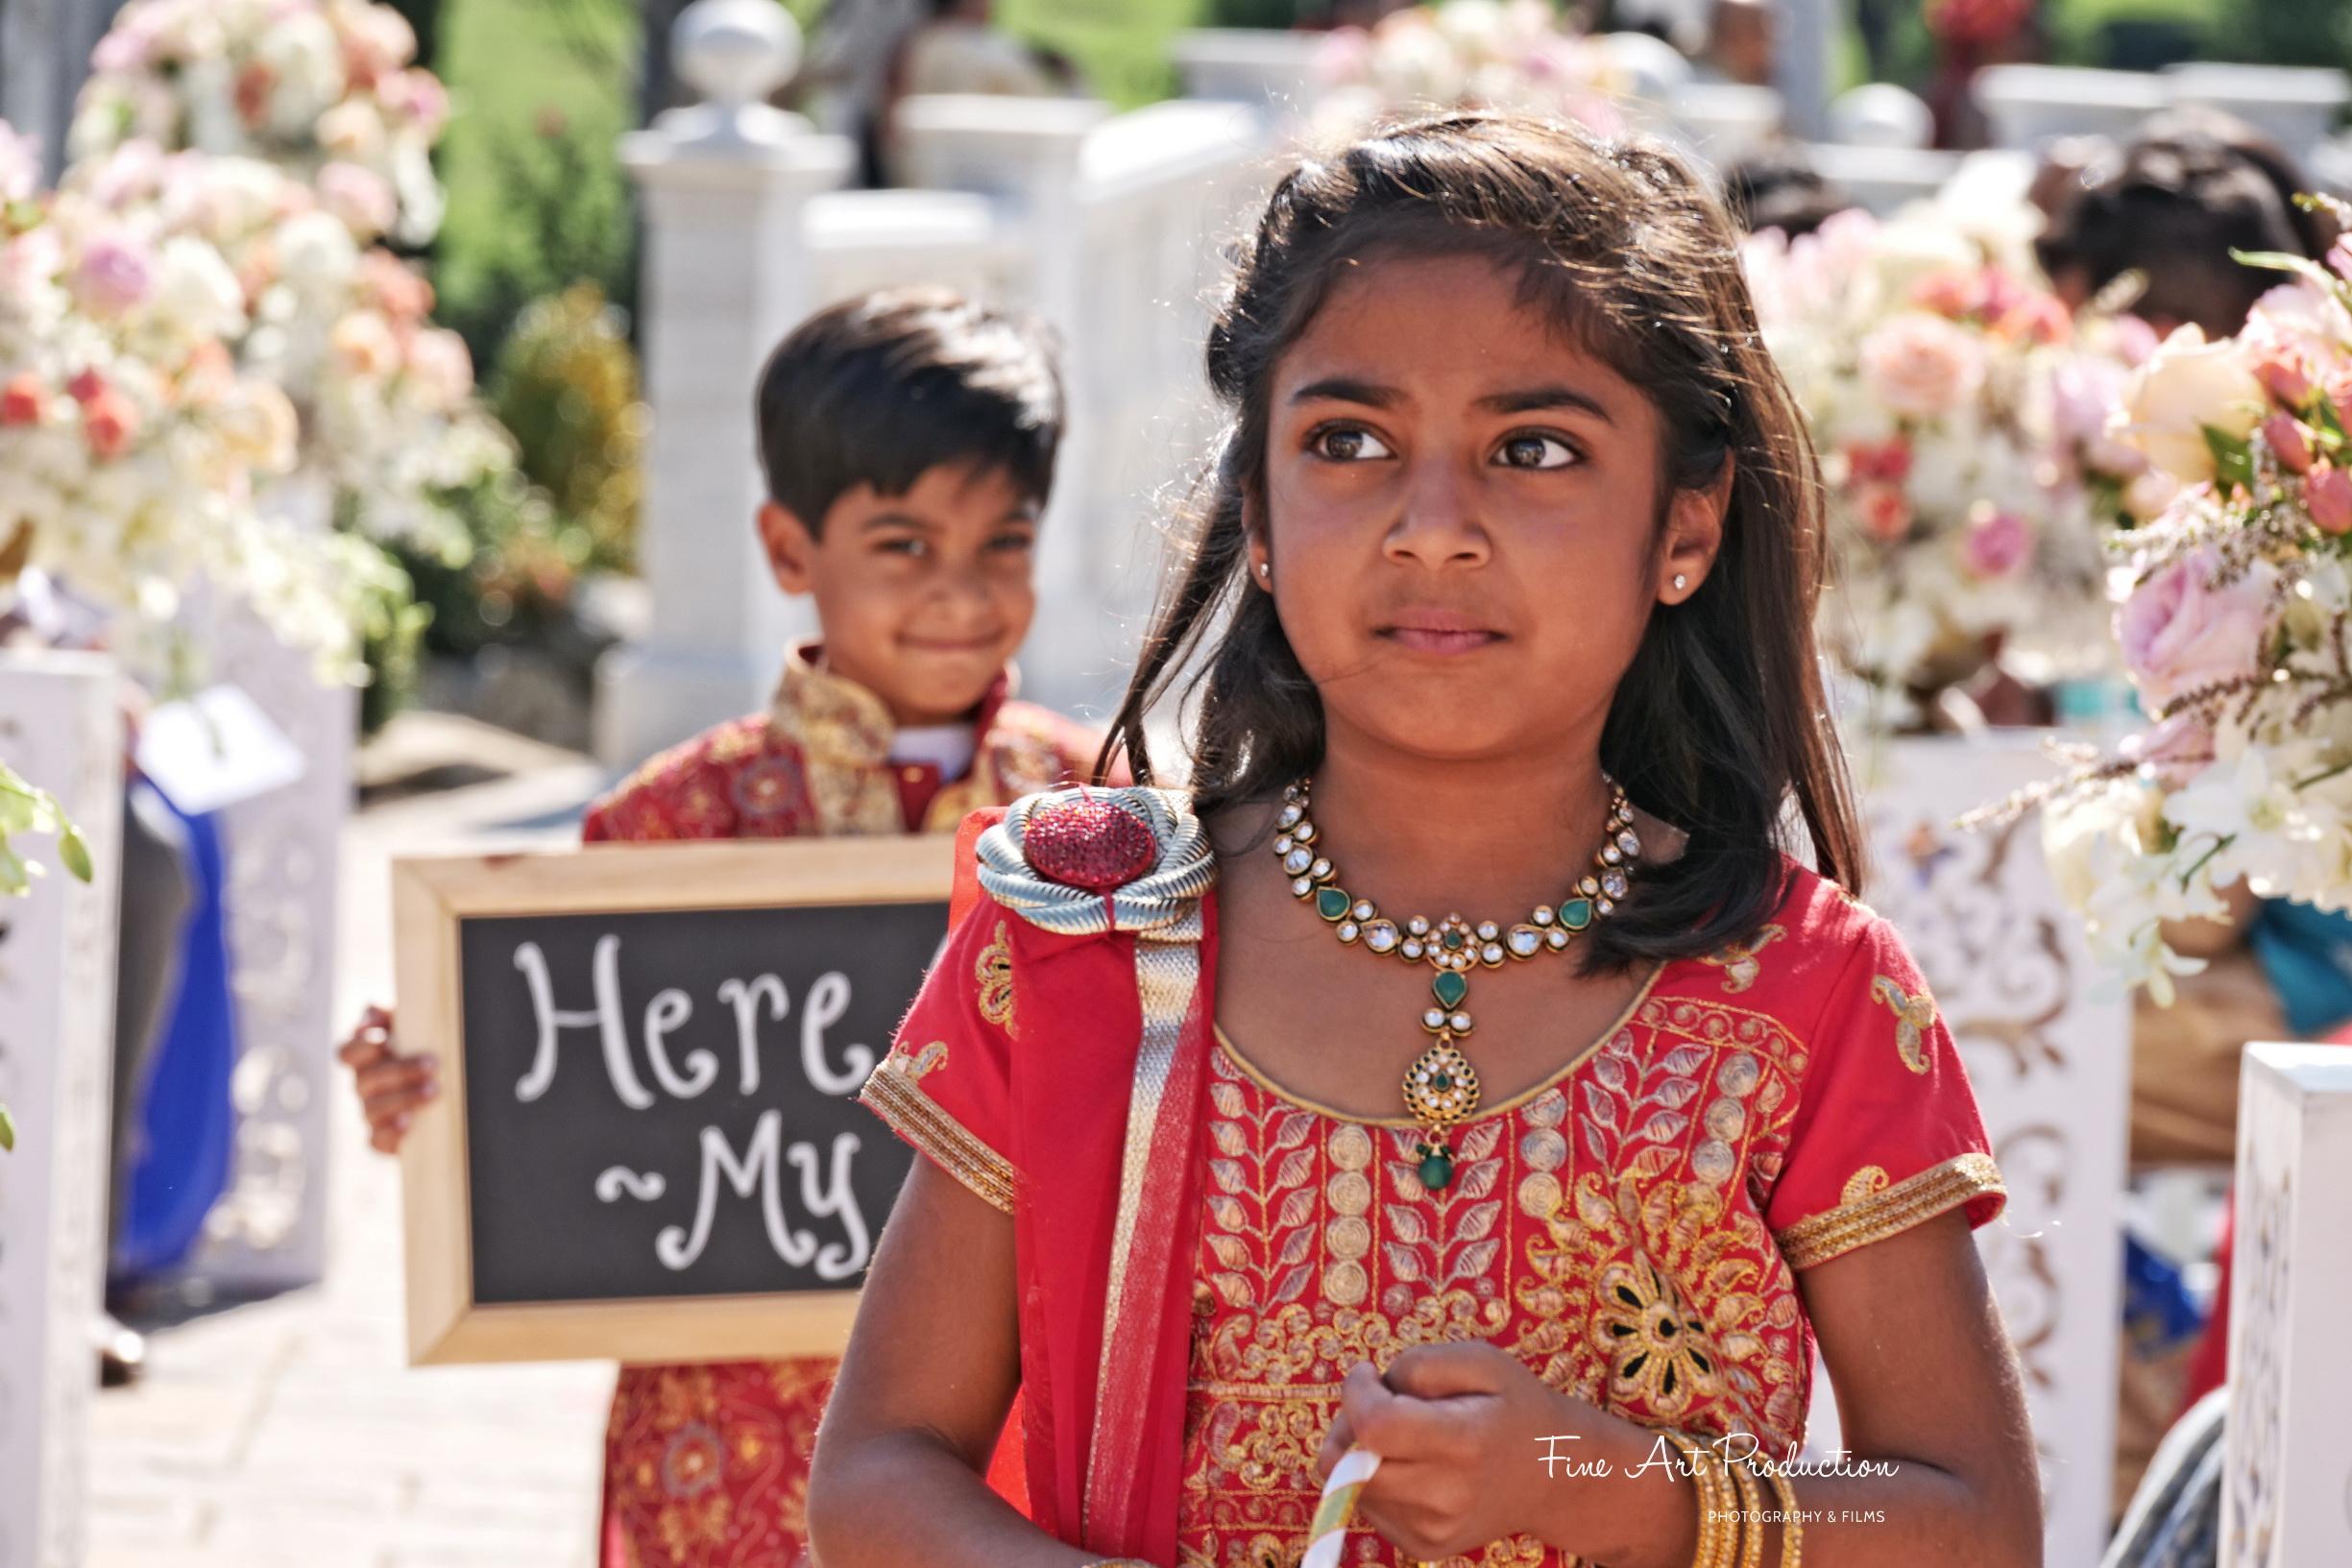 india-wedding-photographer-fine-art-production-chirali-amish-thakkar_0048